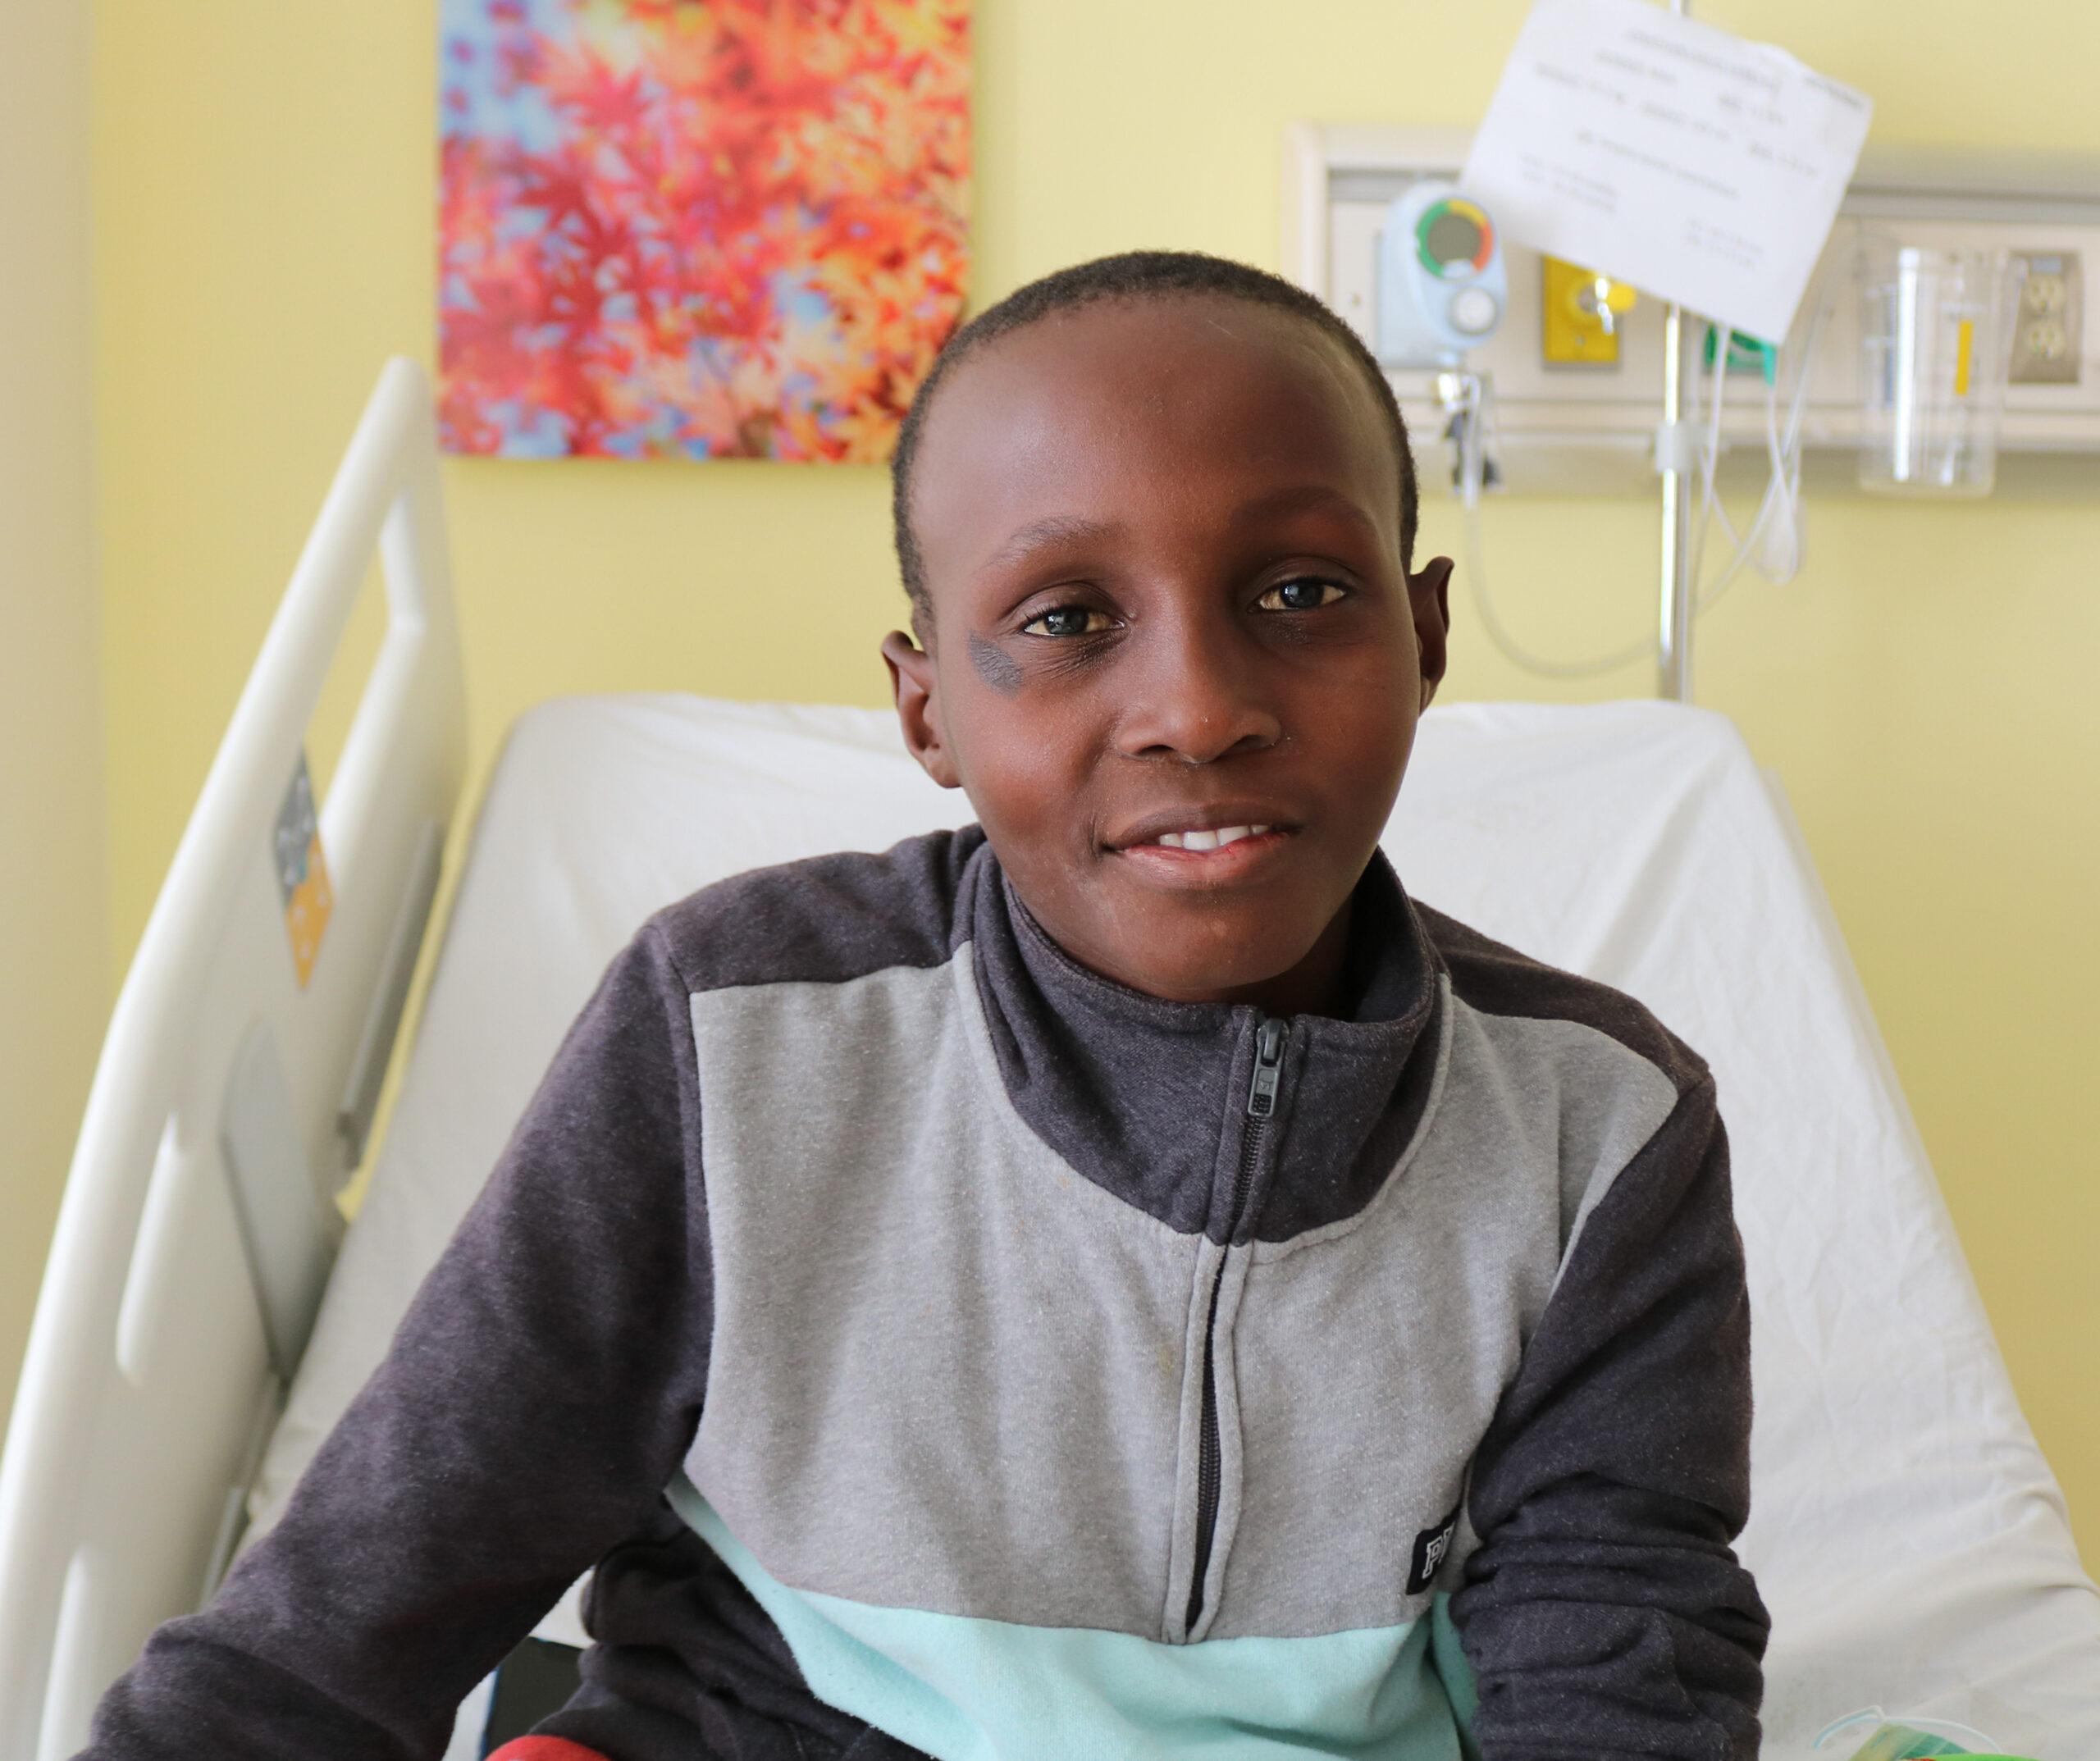 25 niños fueron intervenidos durante jornada cardiovascular pediátrica de CEDIMAT